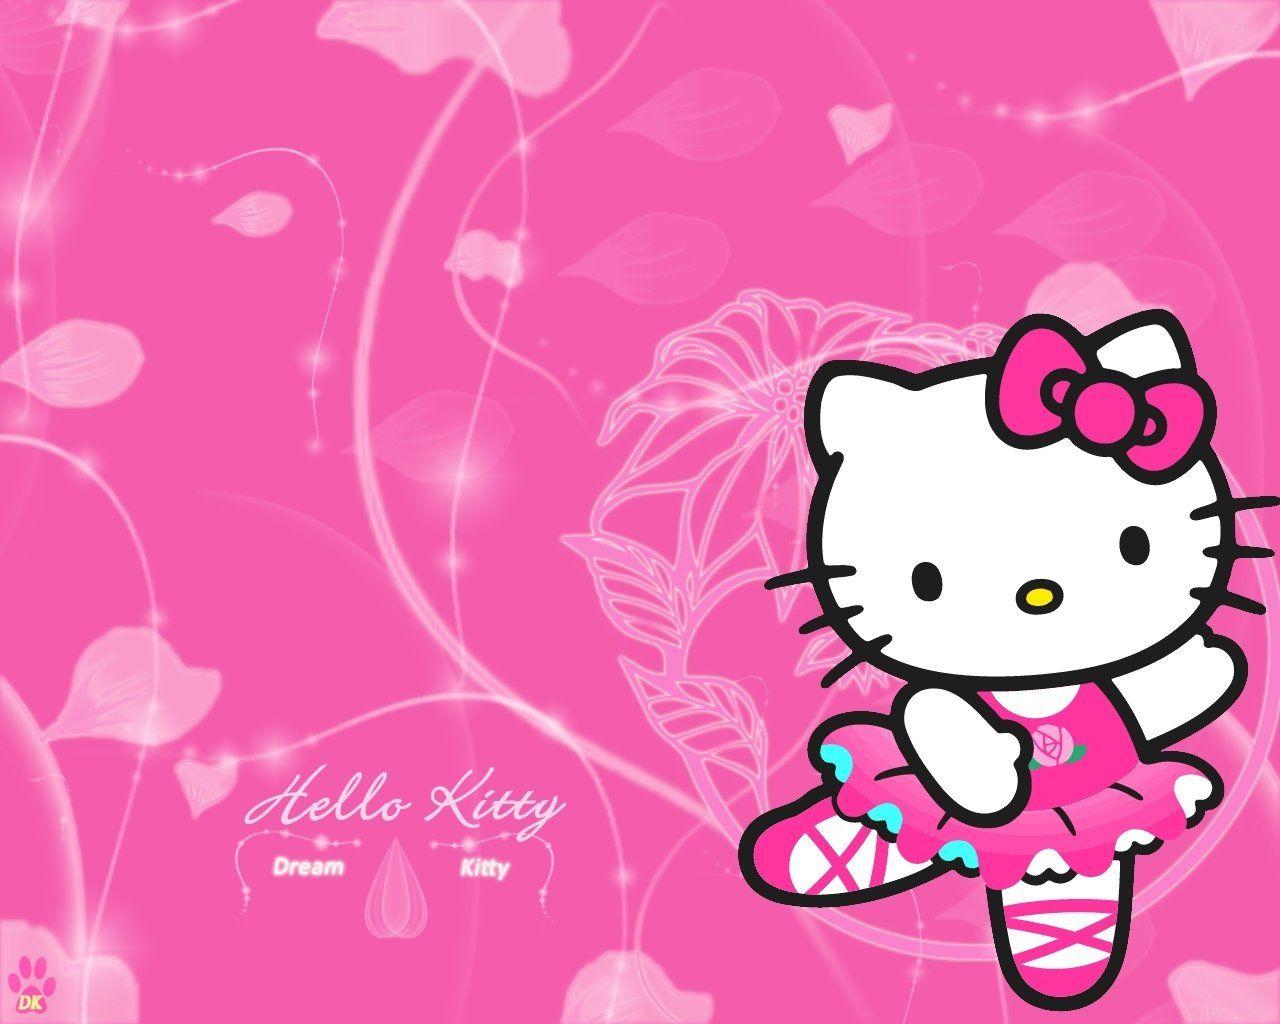 Hello Kitty Wallpaper Galaxy Note 2